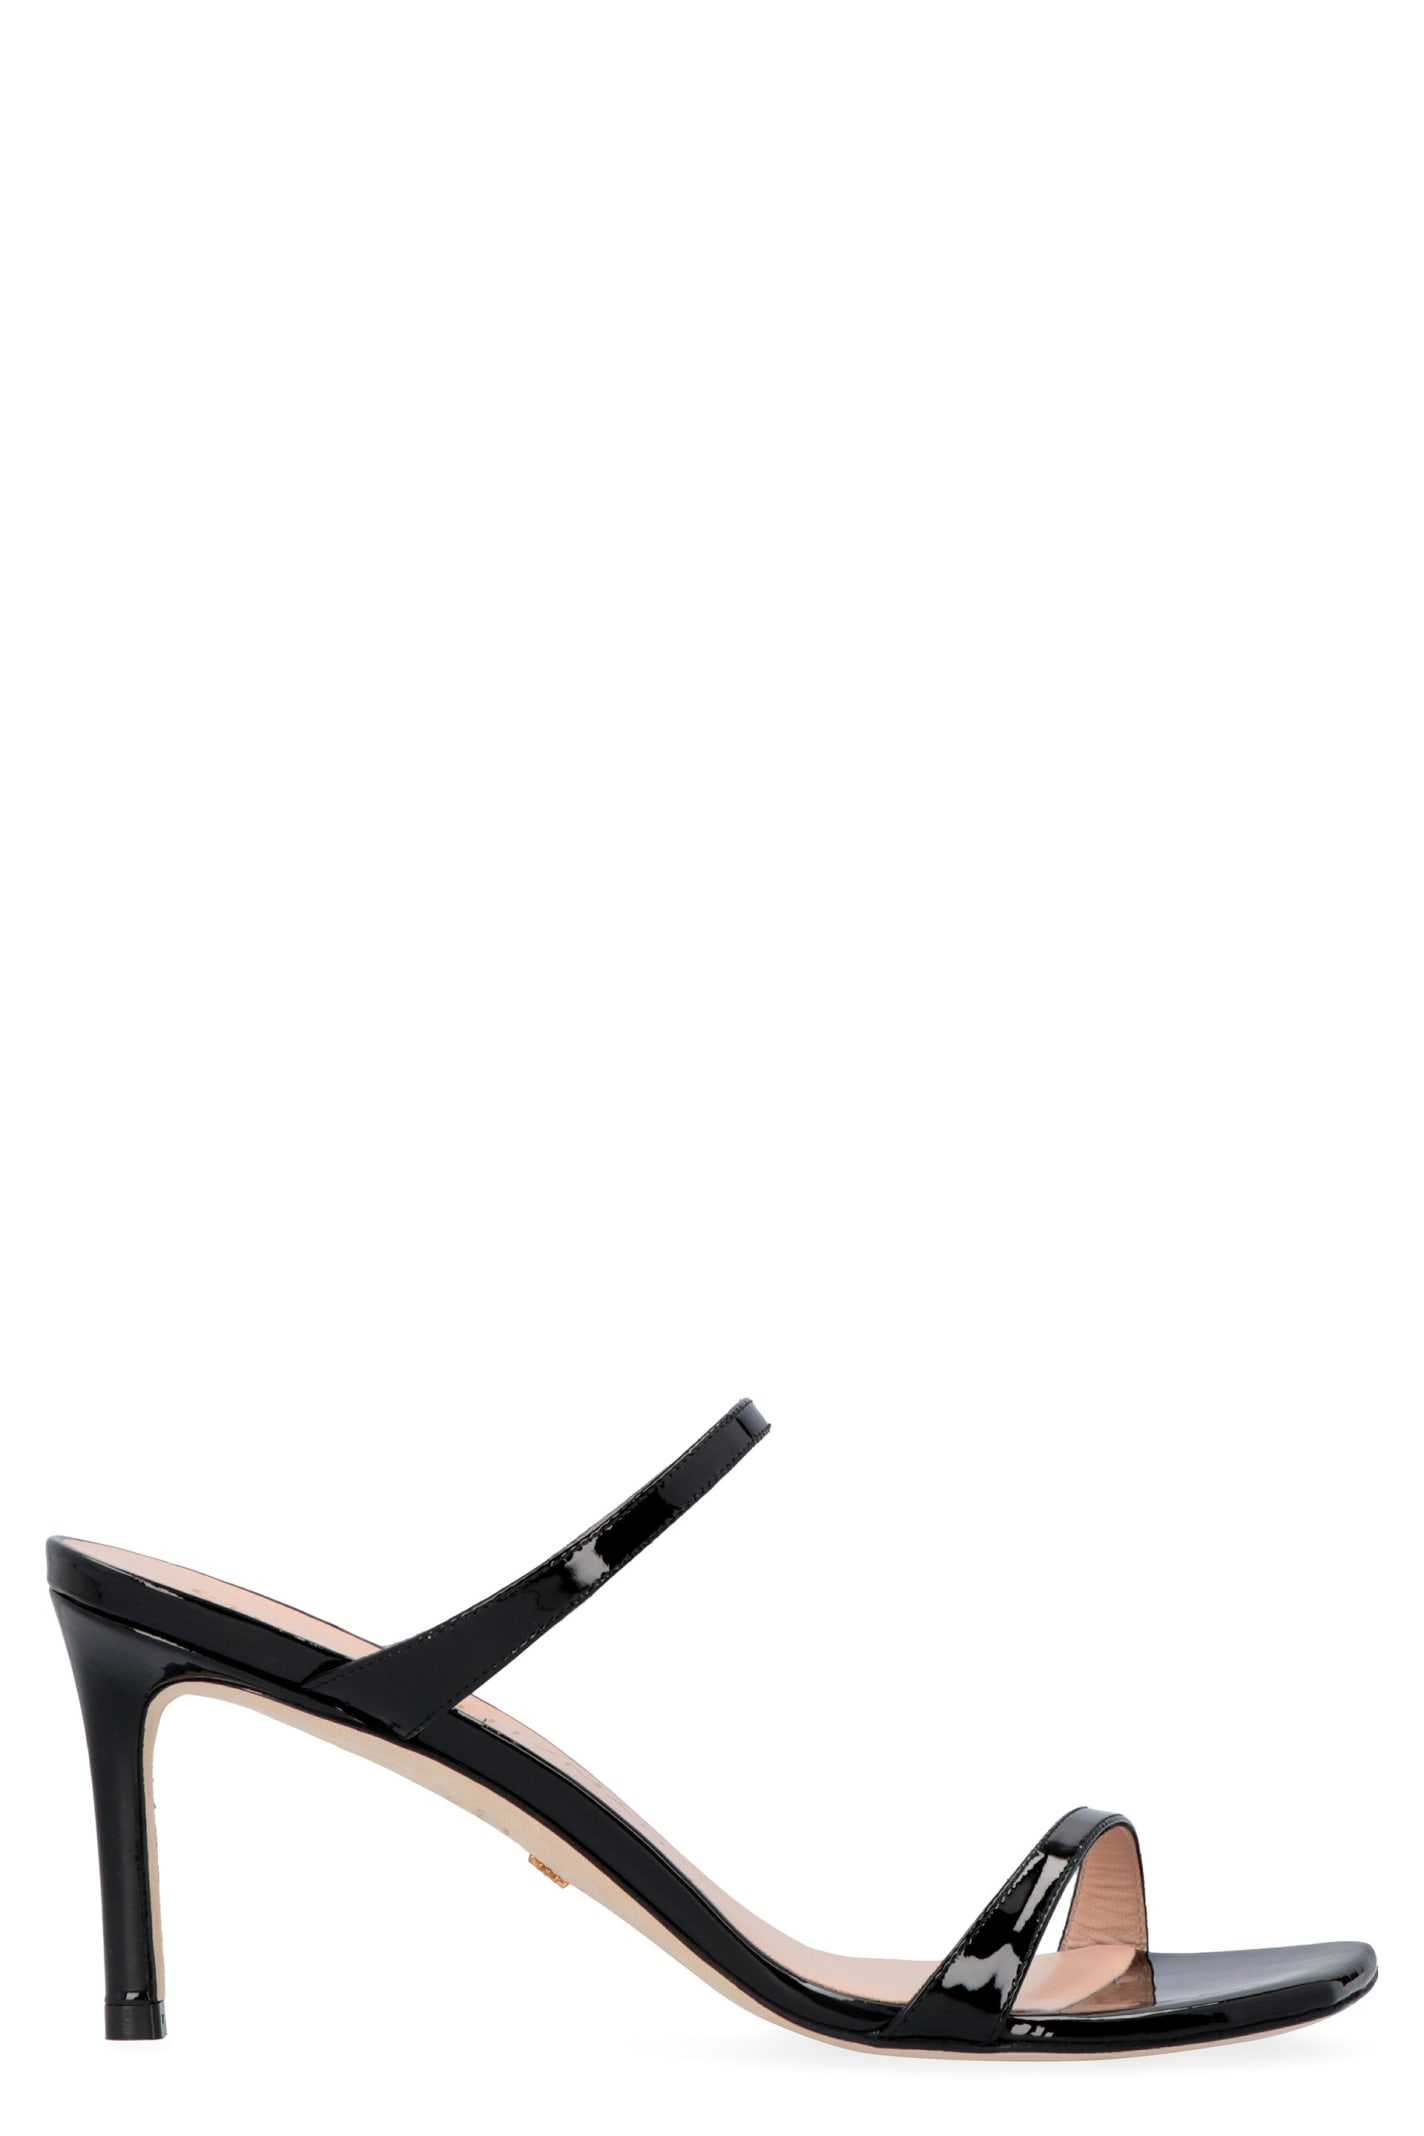 Buy Stuart Weitzman Aleena Patent Leather Sandals online, shop Stuart Weitzman shoes with free shipping